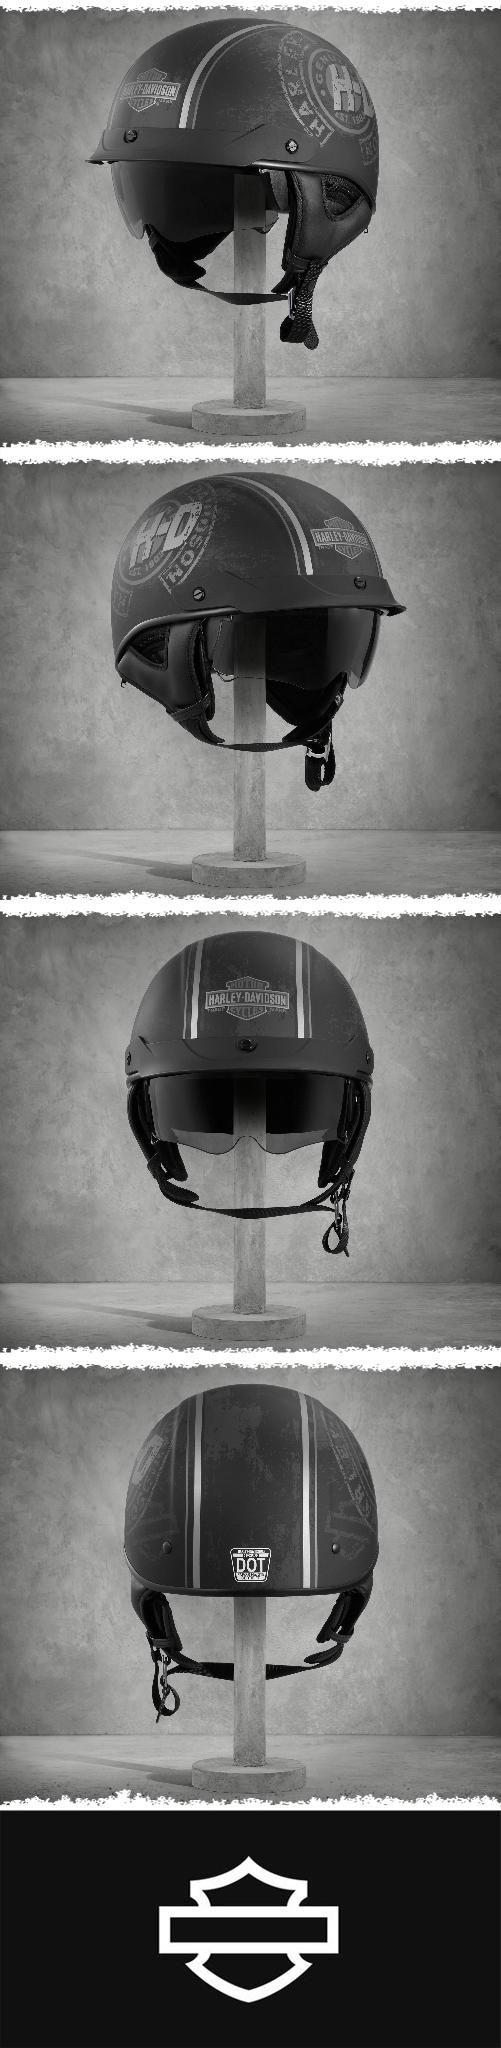 This bad boy is ready to take on the most legendary rides. | Harley-Davidson Wilcox Ultra-Light Sun Shield J03 Half Helmet